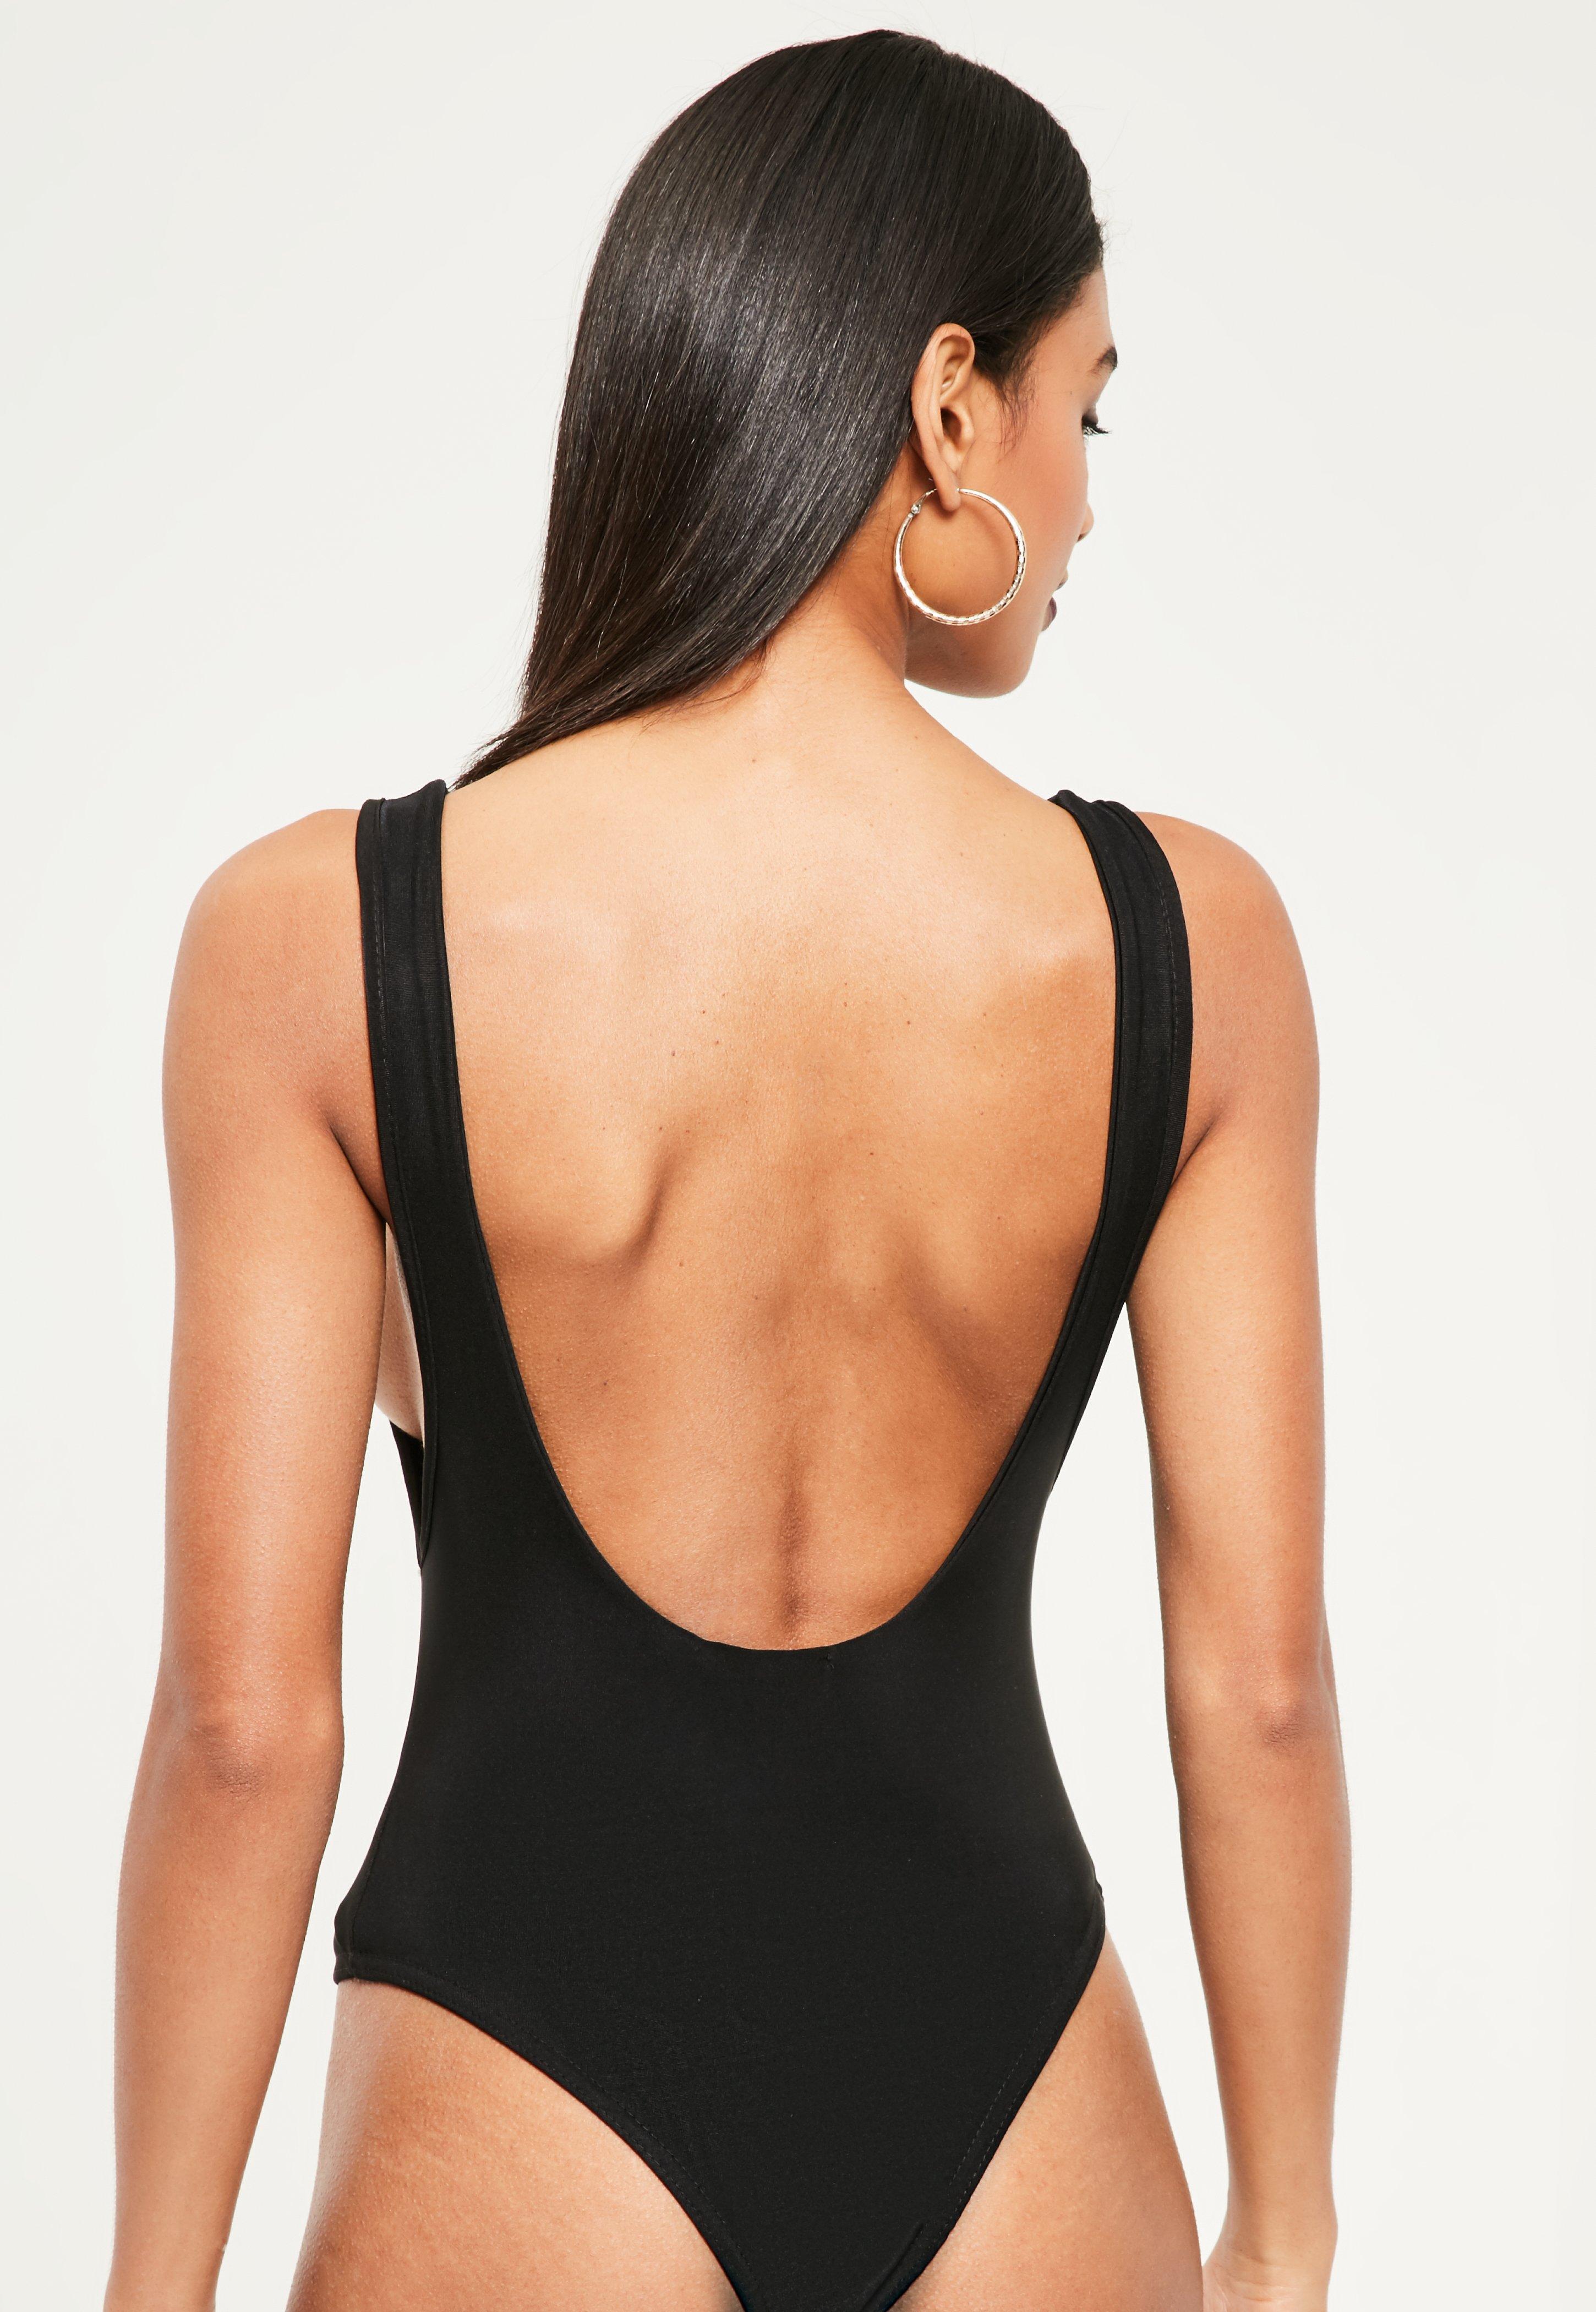 Lyst - Missguided Extreme Scoop Back Bodysuit Black in Black 5c8aff5d2